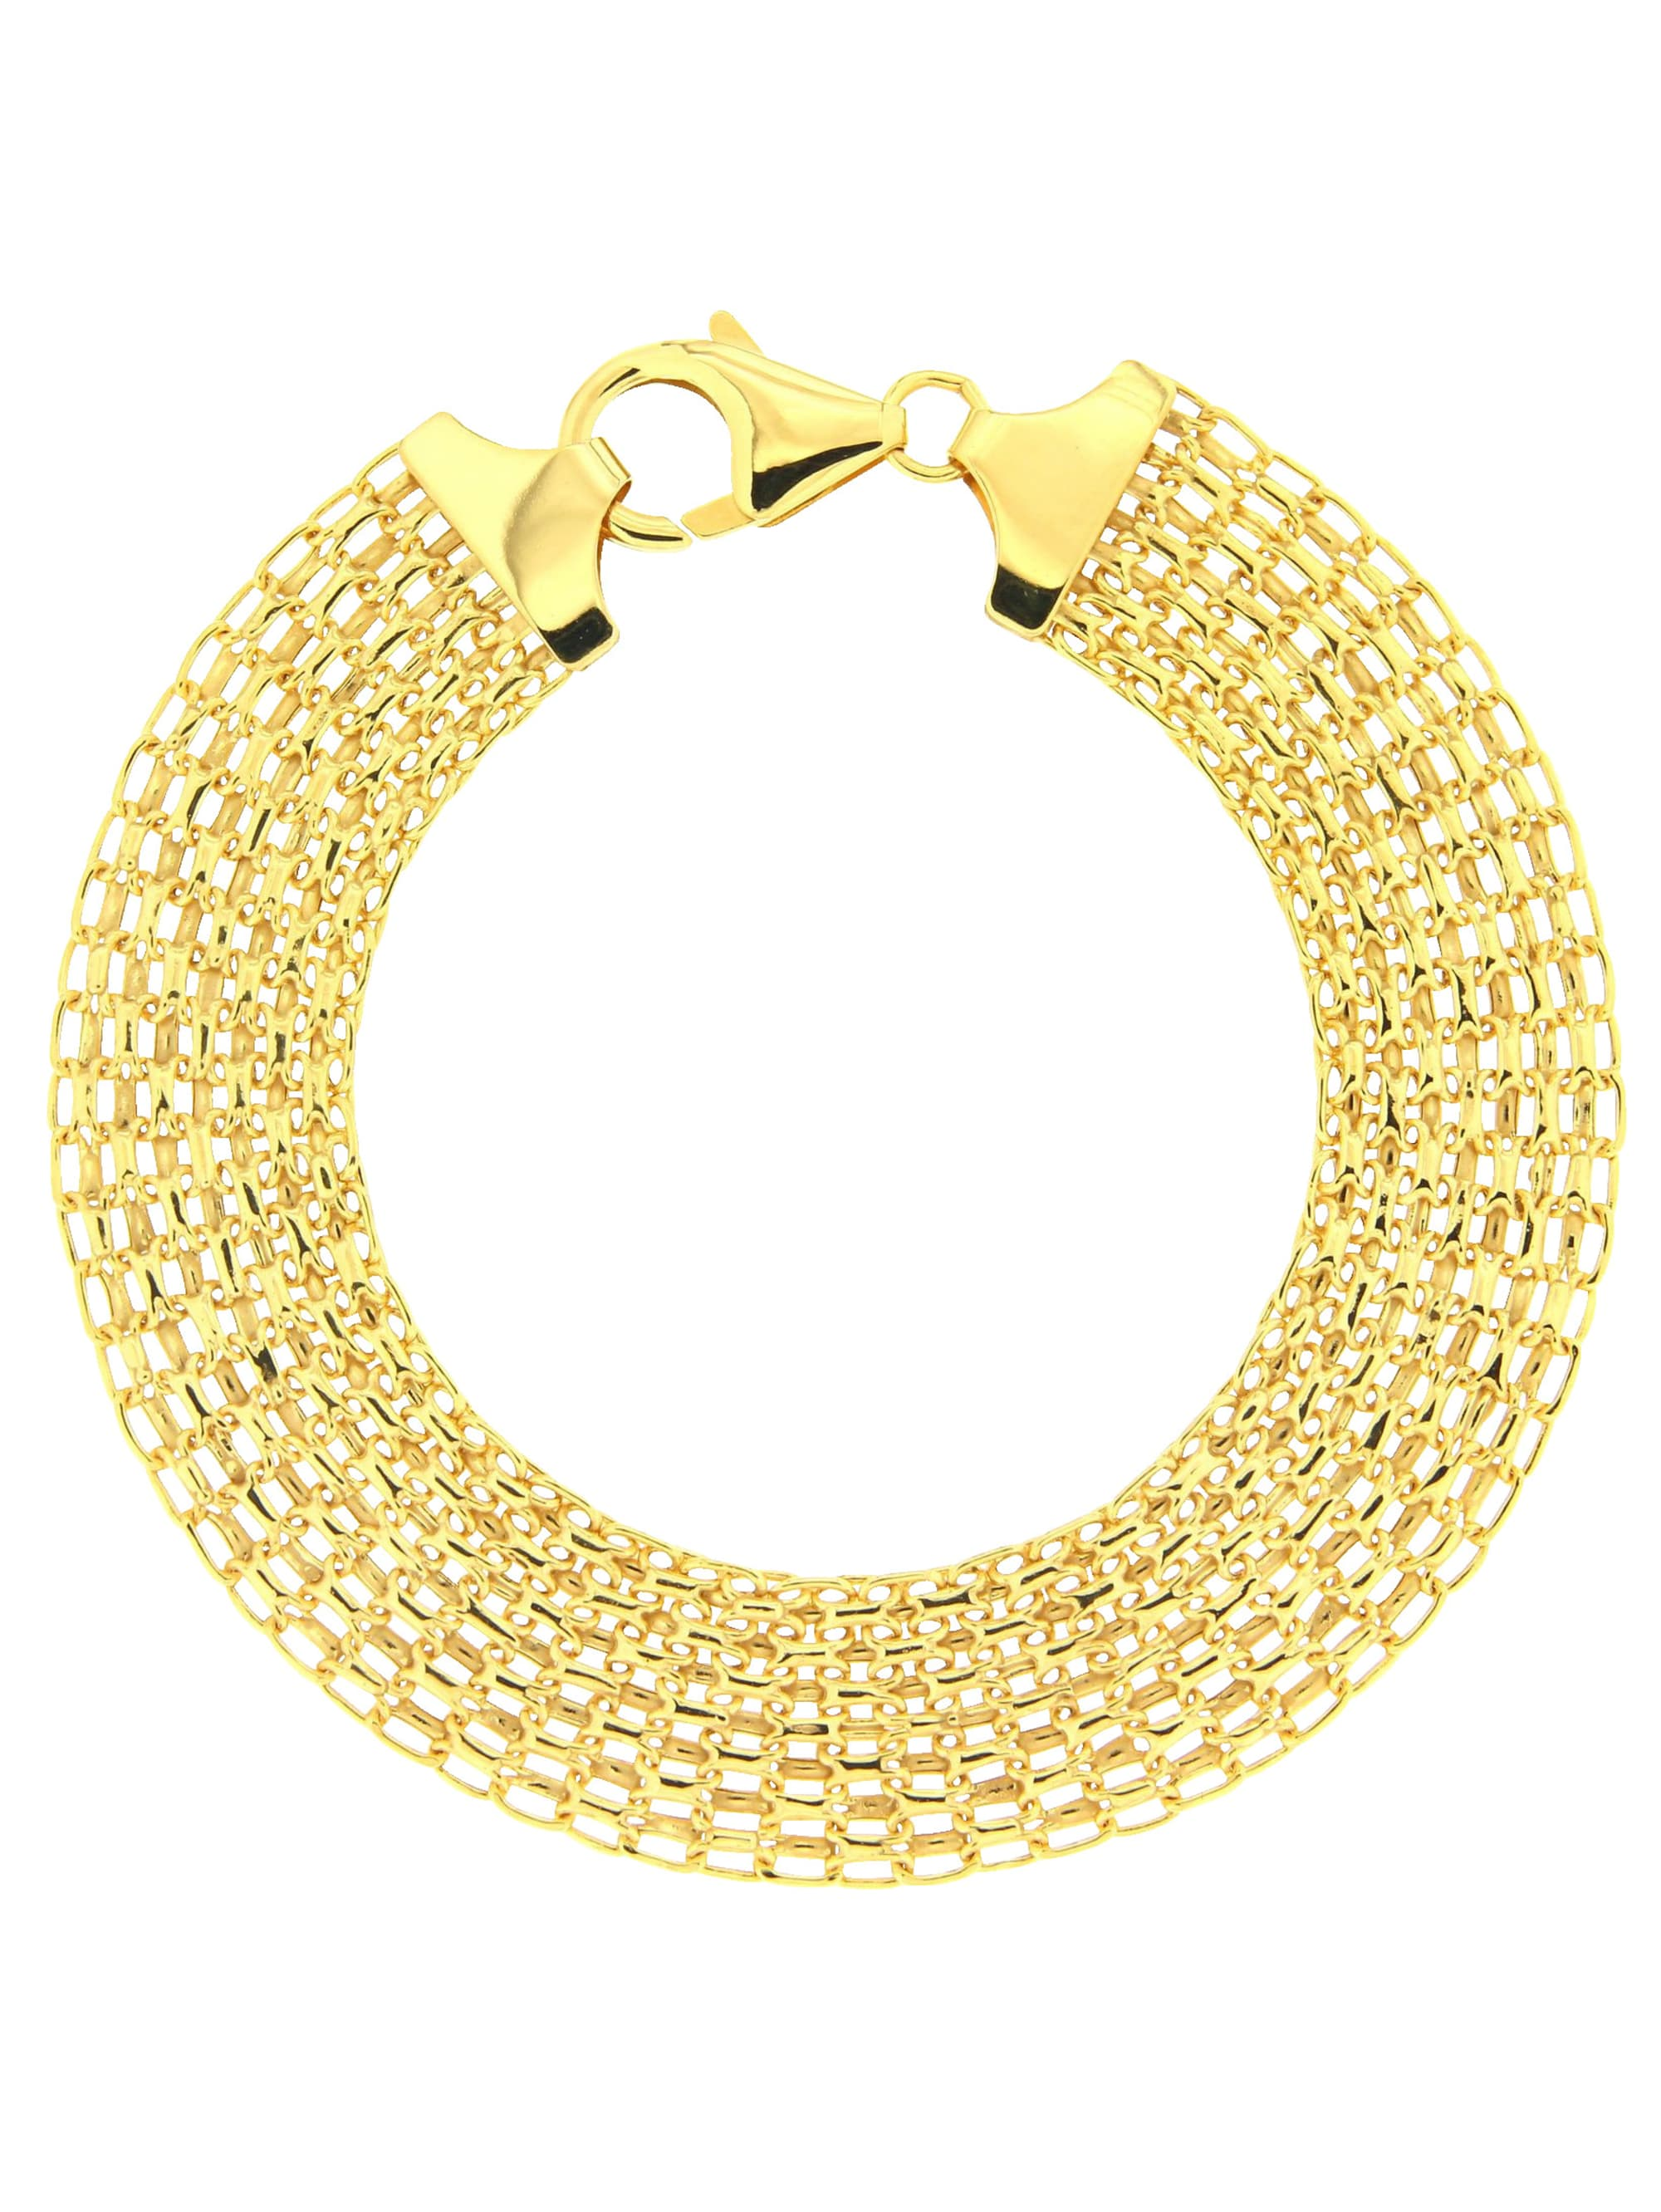 Grazielli Armband in Gelbgold 375 vSeoC